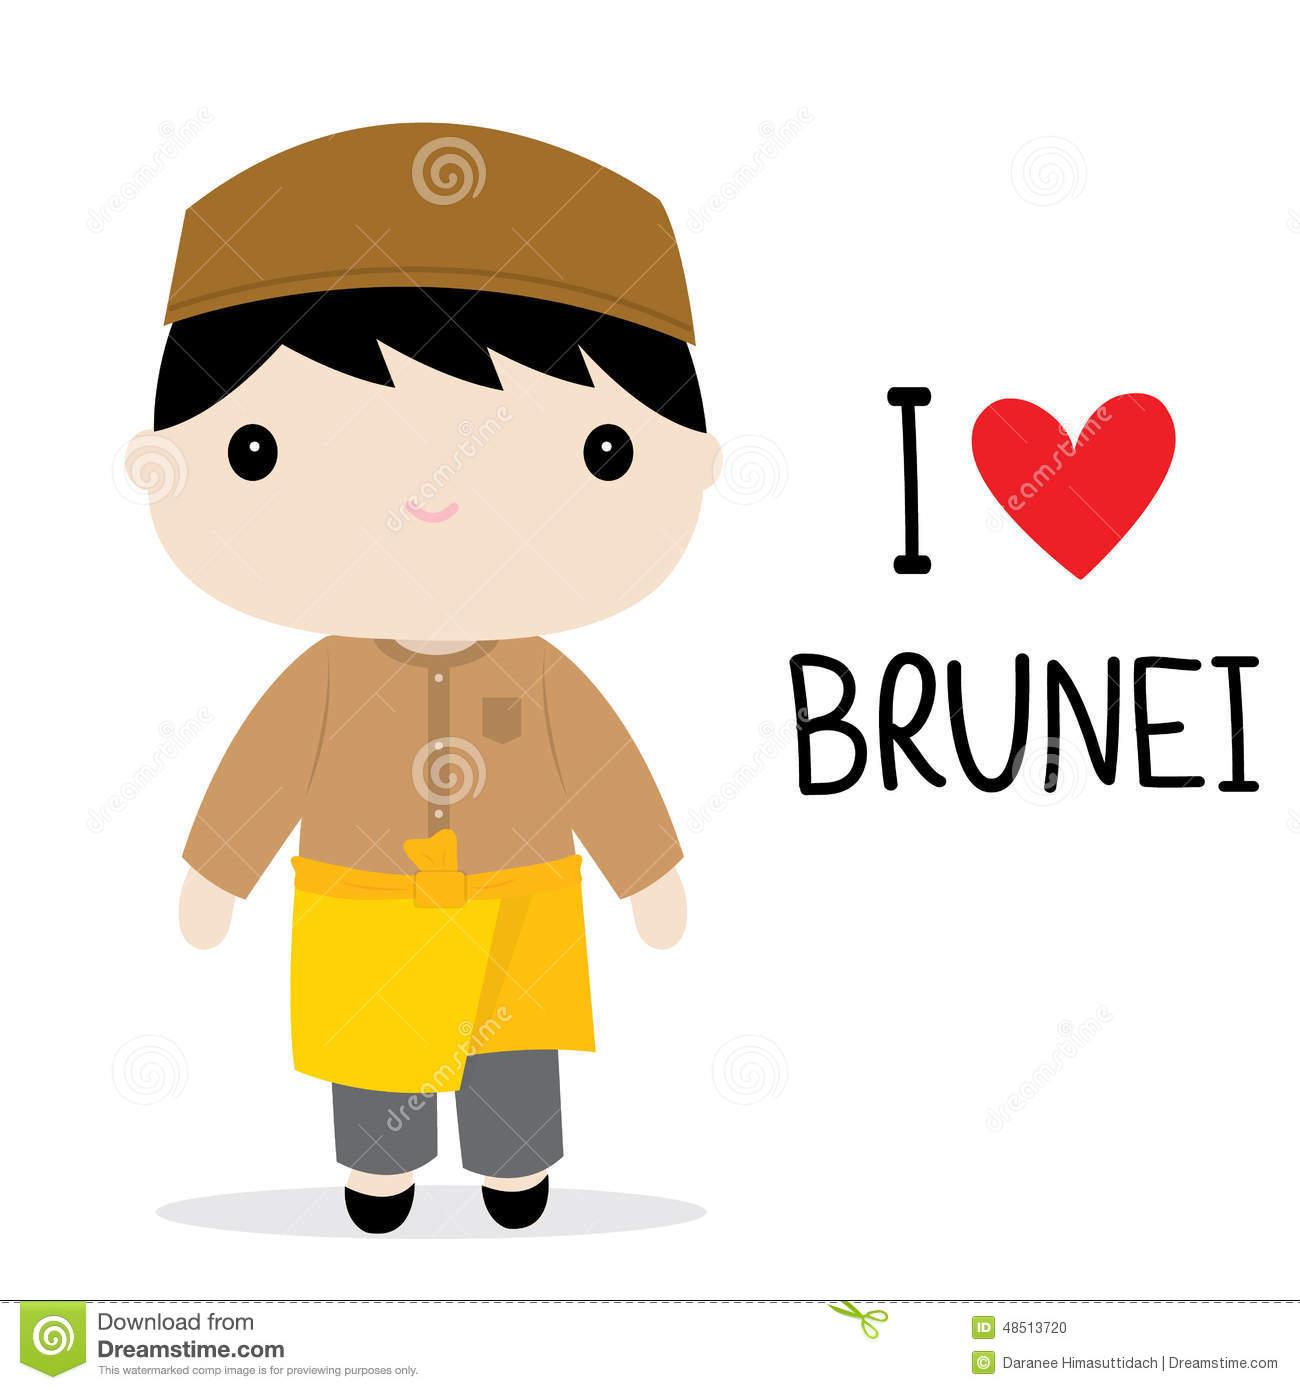 Brunei Men National Dress Cartoon Vector Stock Vector.